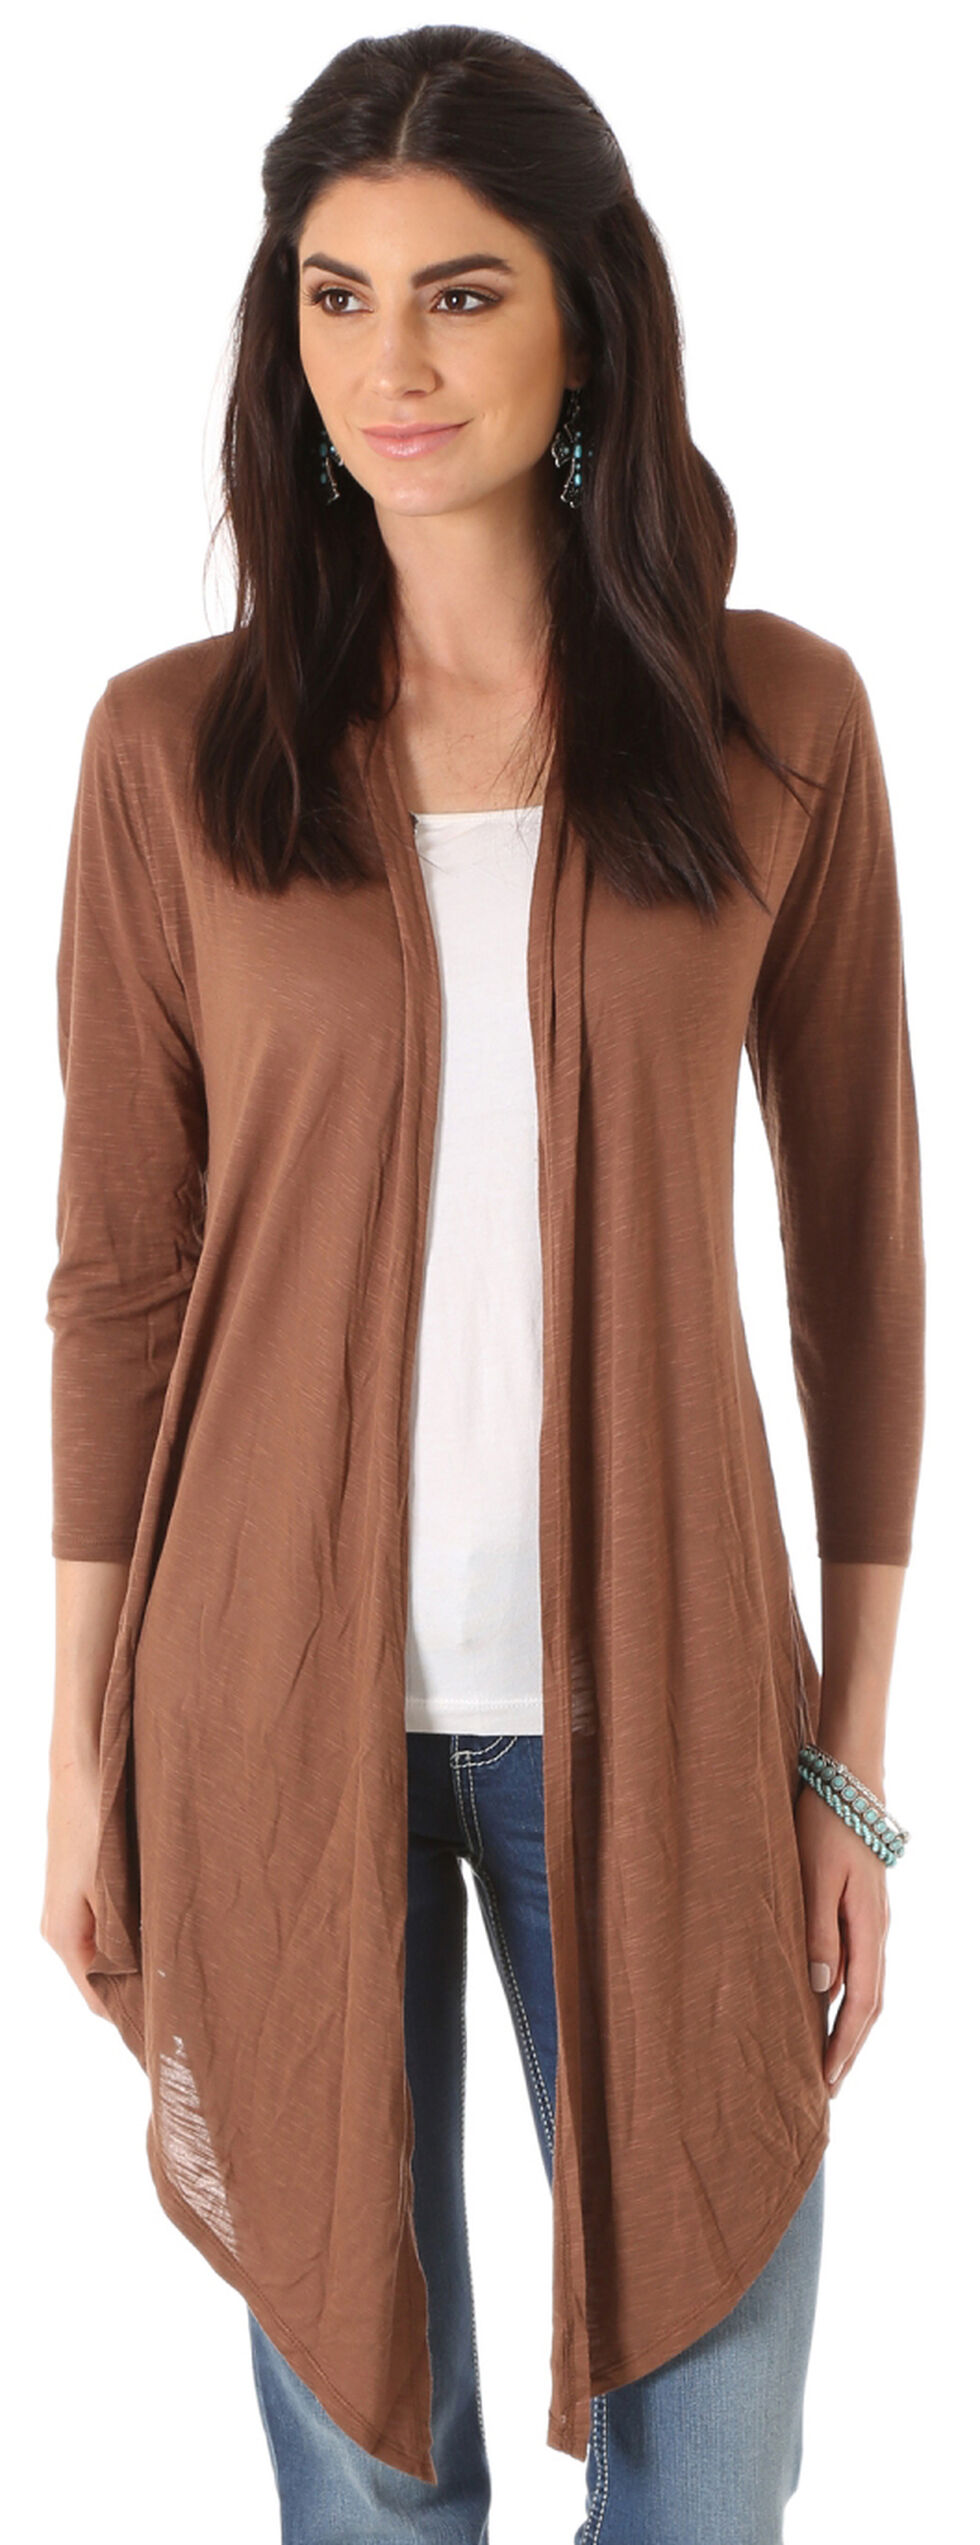 Wrangler Women's Three Quarter Sleeve Length Solid Cardigan, Brown, hi-res